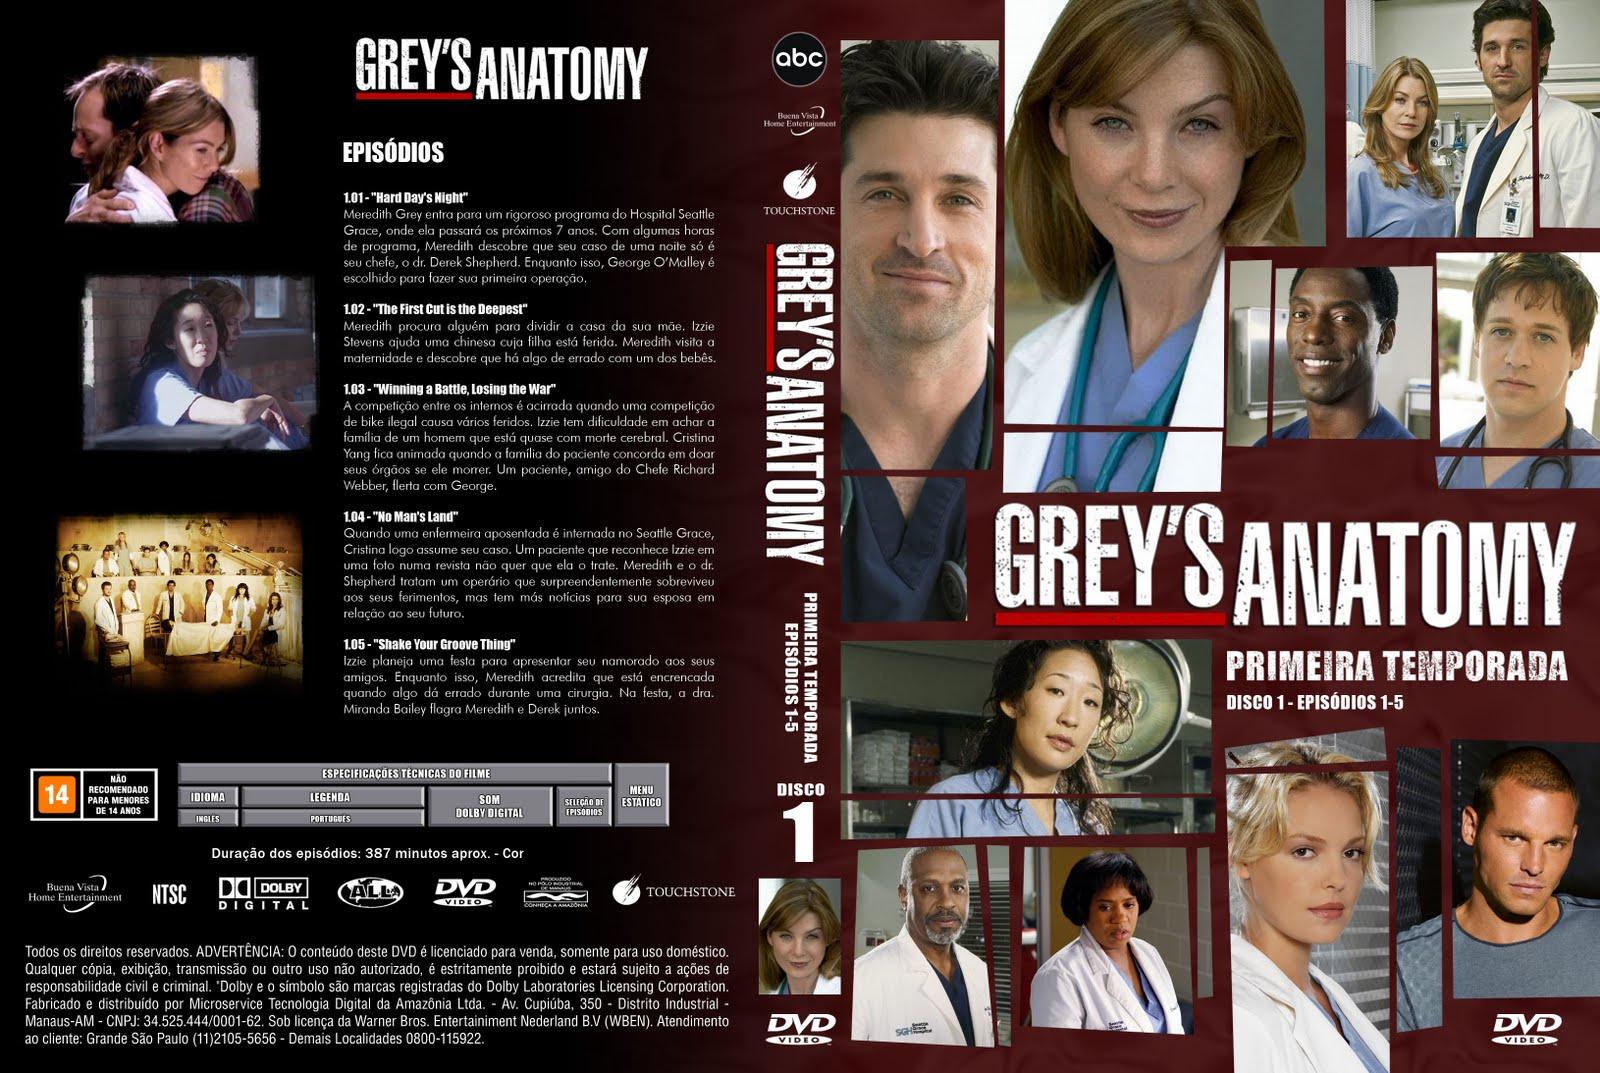 Greys anatomy season 9 trailer 2012 : Best website download movies free